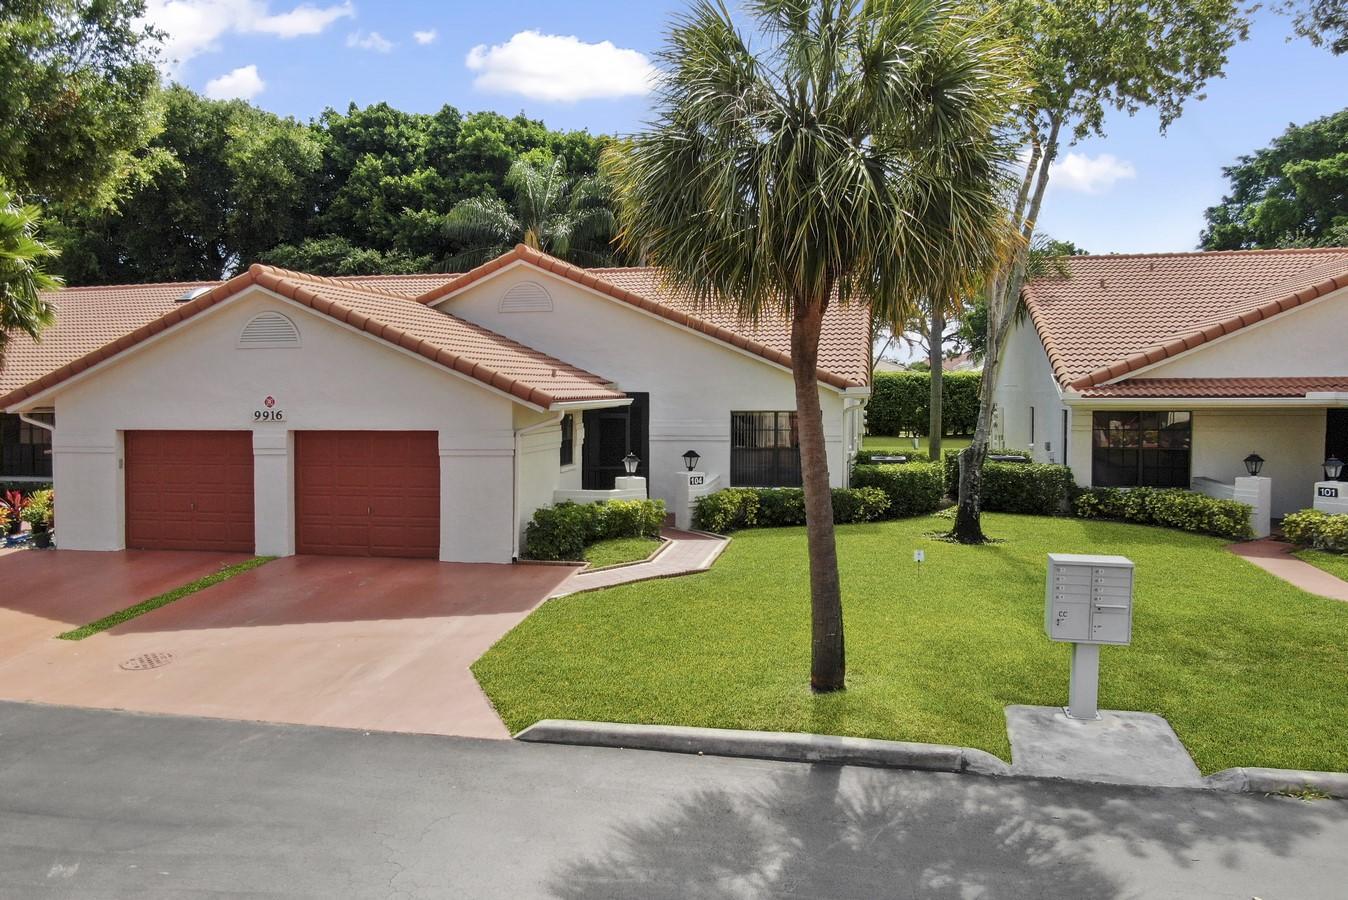 9916 Pavarotti Terrace 104 Boynton Beach, FL 33437 photo 26